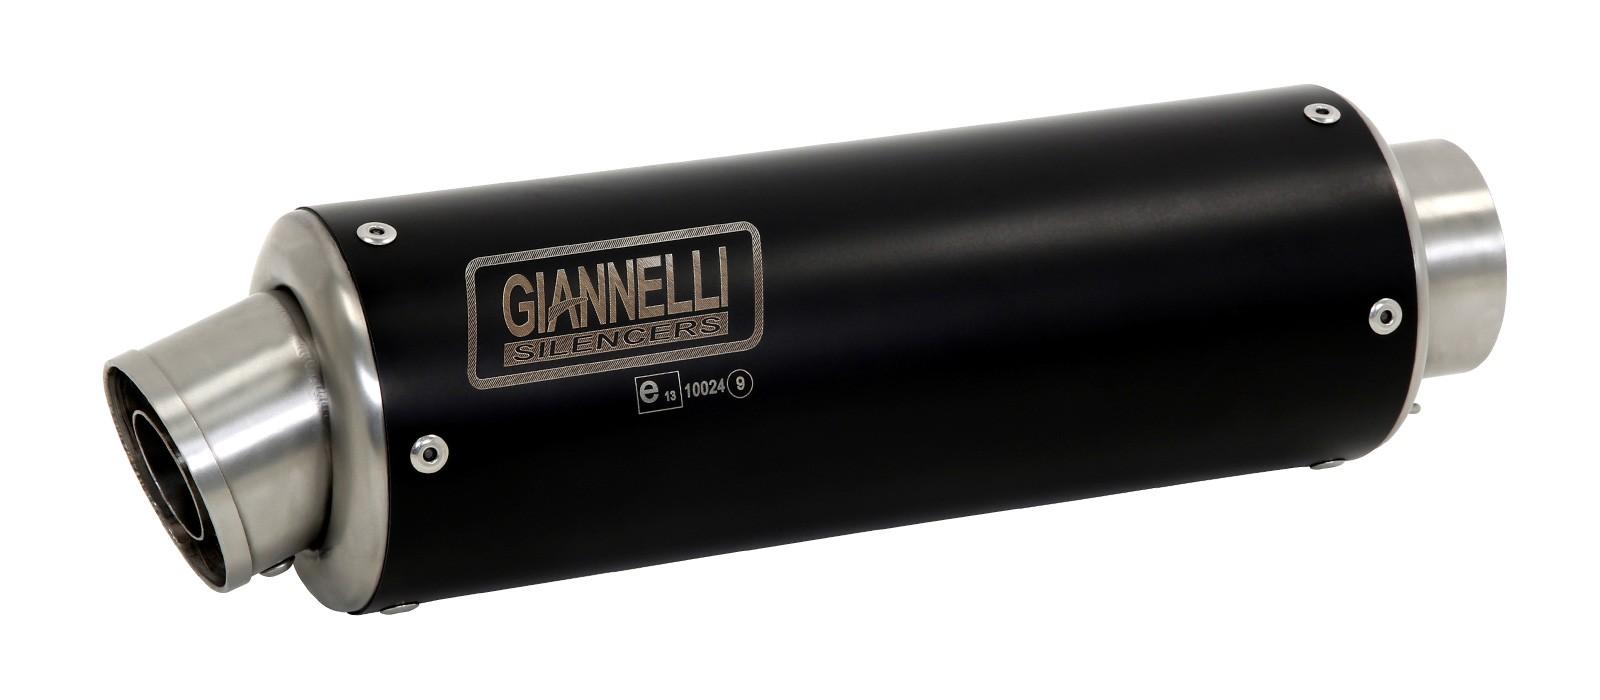 ESCAPES GIANNELLI YAMAHA - Slip-on nicrom black X-PRO Yamaha YZF 600 R6 Giannelli 73533XP -